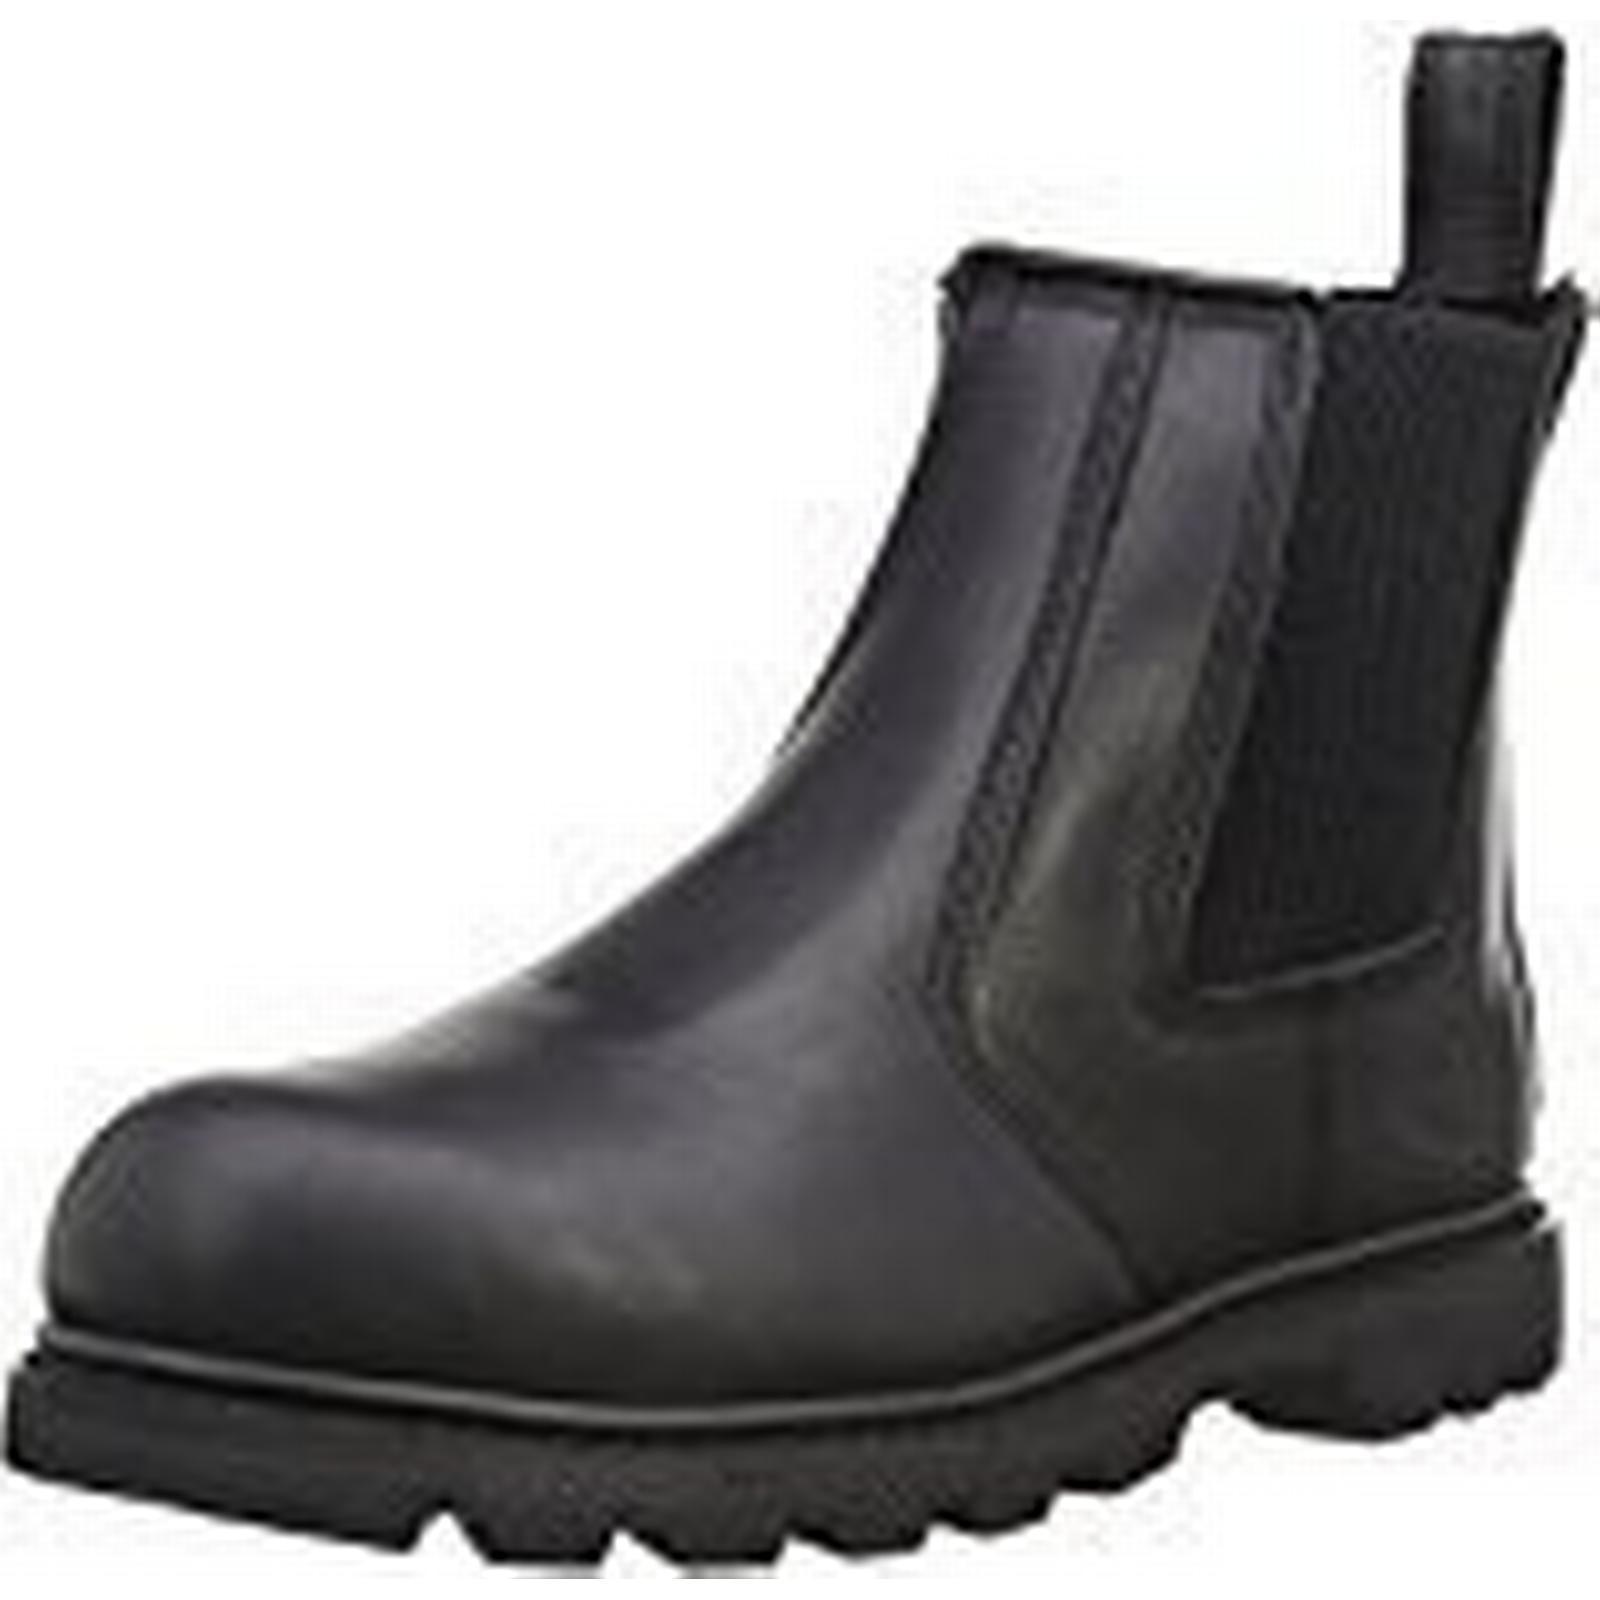 Dickies Mens Fife SB-P Safety Boots Regular FD9214 Black 6 UK Regular Boots - EN safety certified c7472b